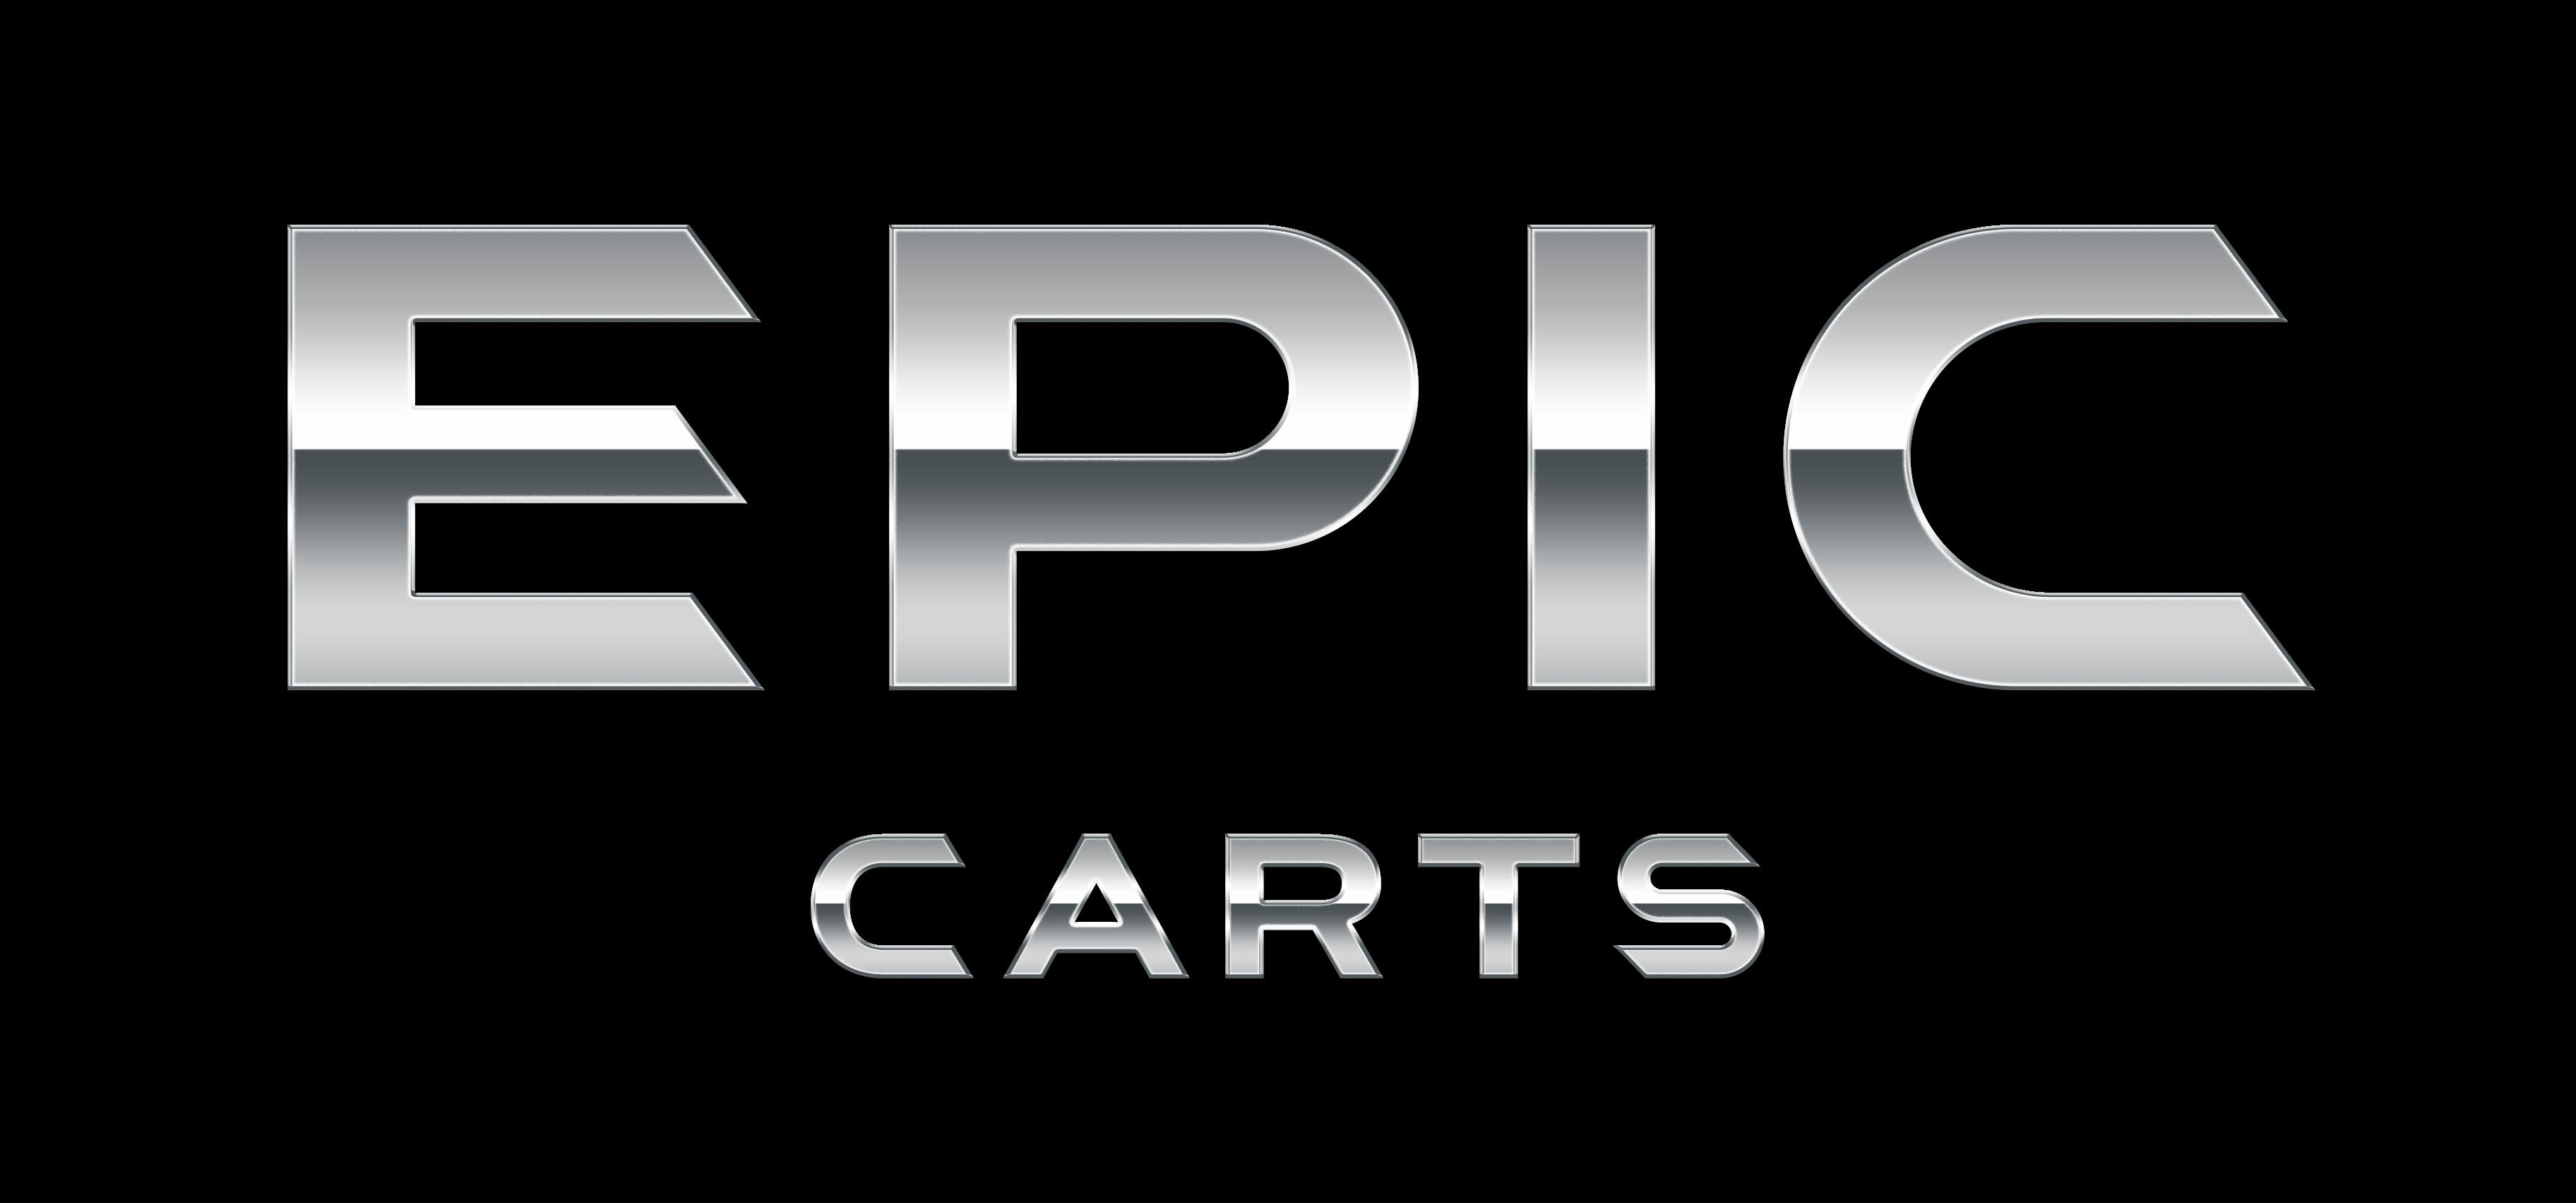 EPIC carts